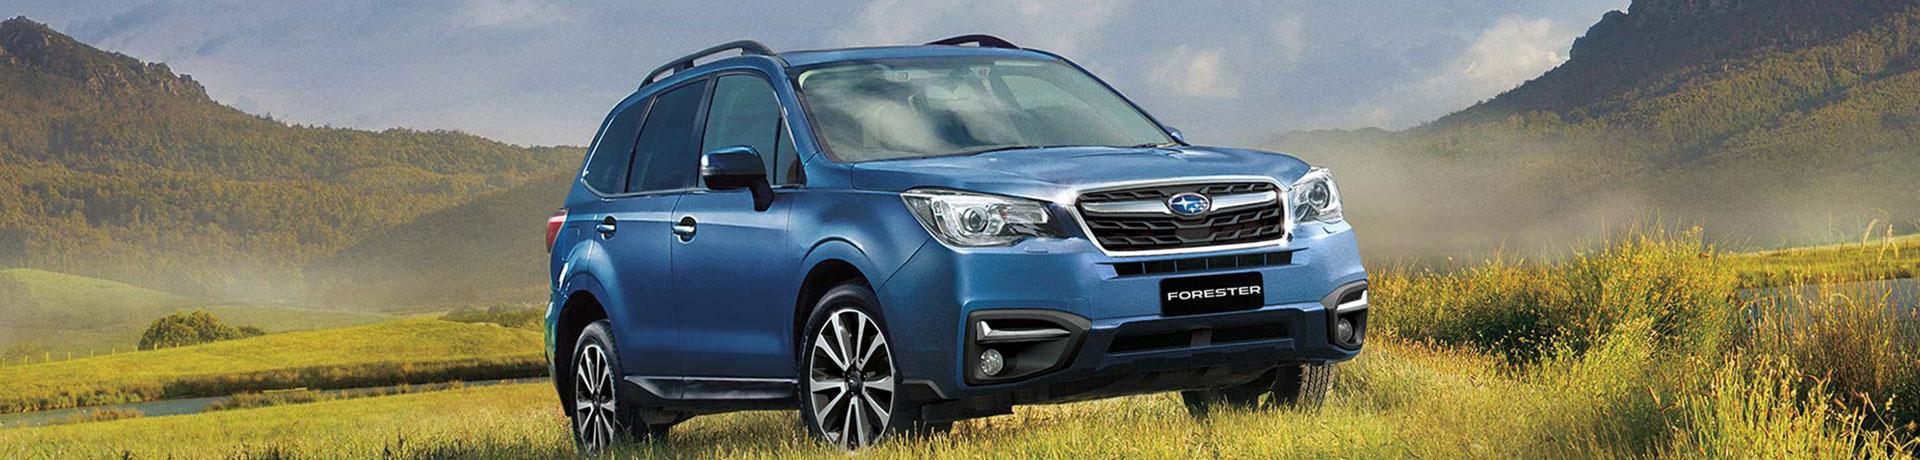 Forester Subaru Echuca Fuel Filter